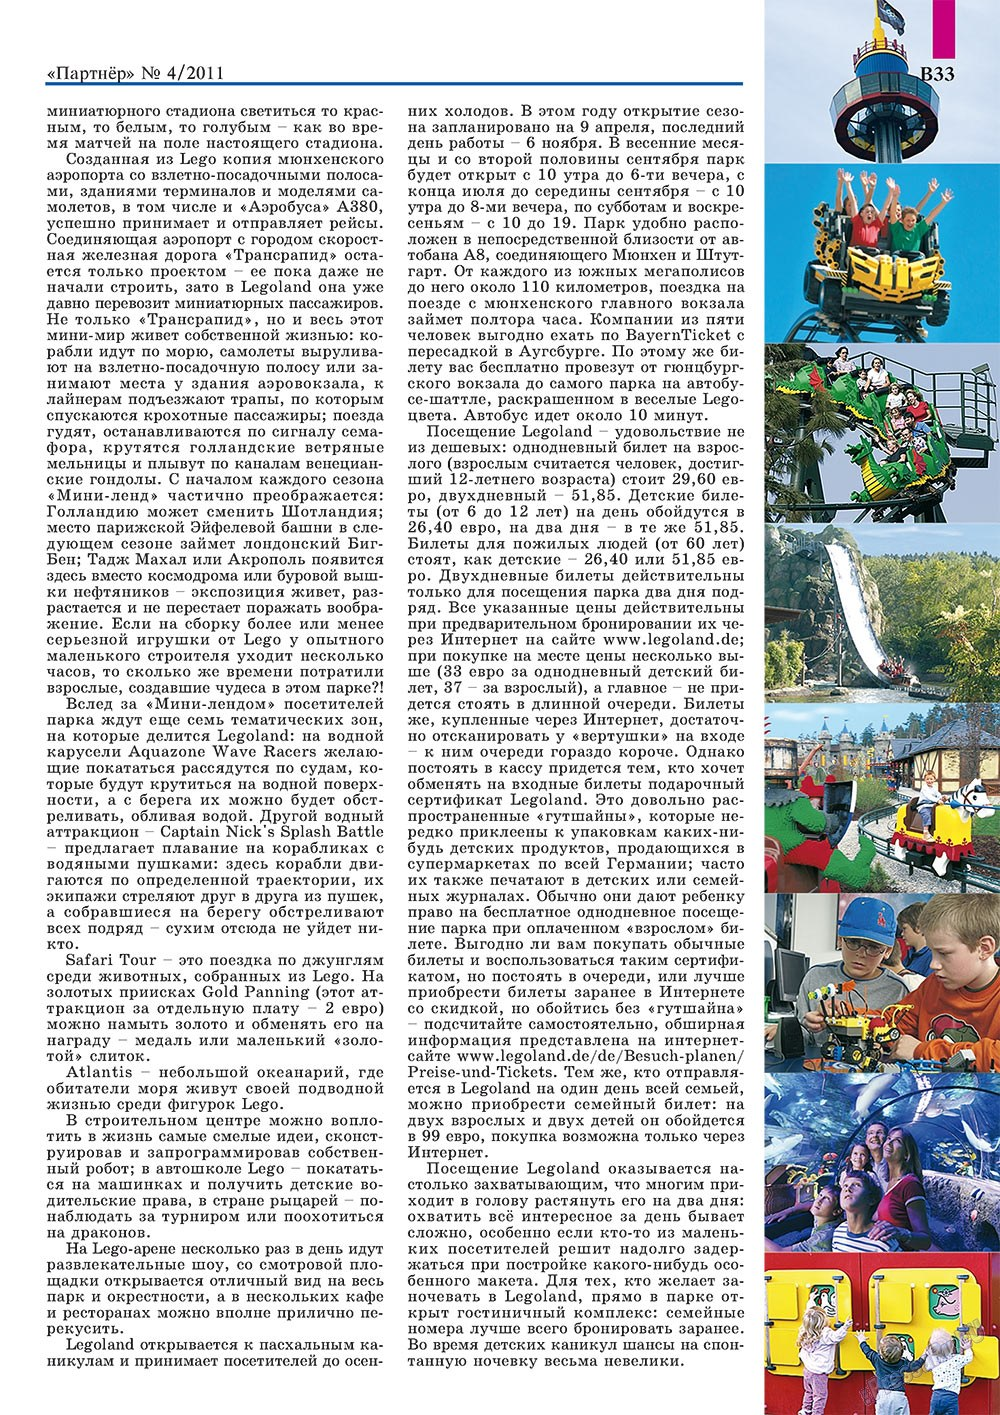 Партнер-север (журнал). 2011 год, номер 4, стр. 43